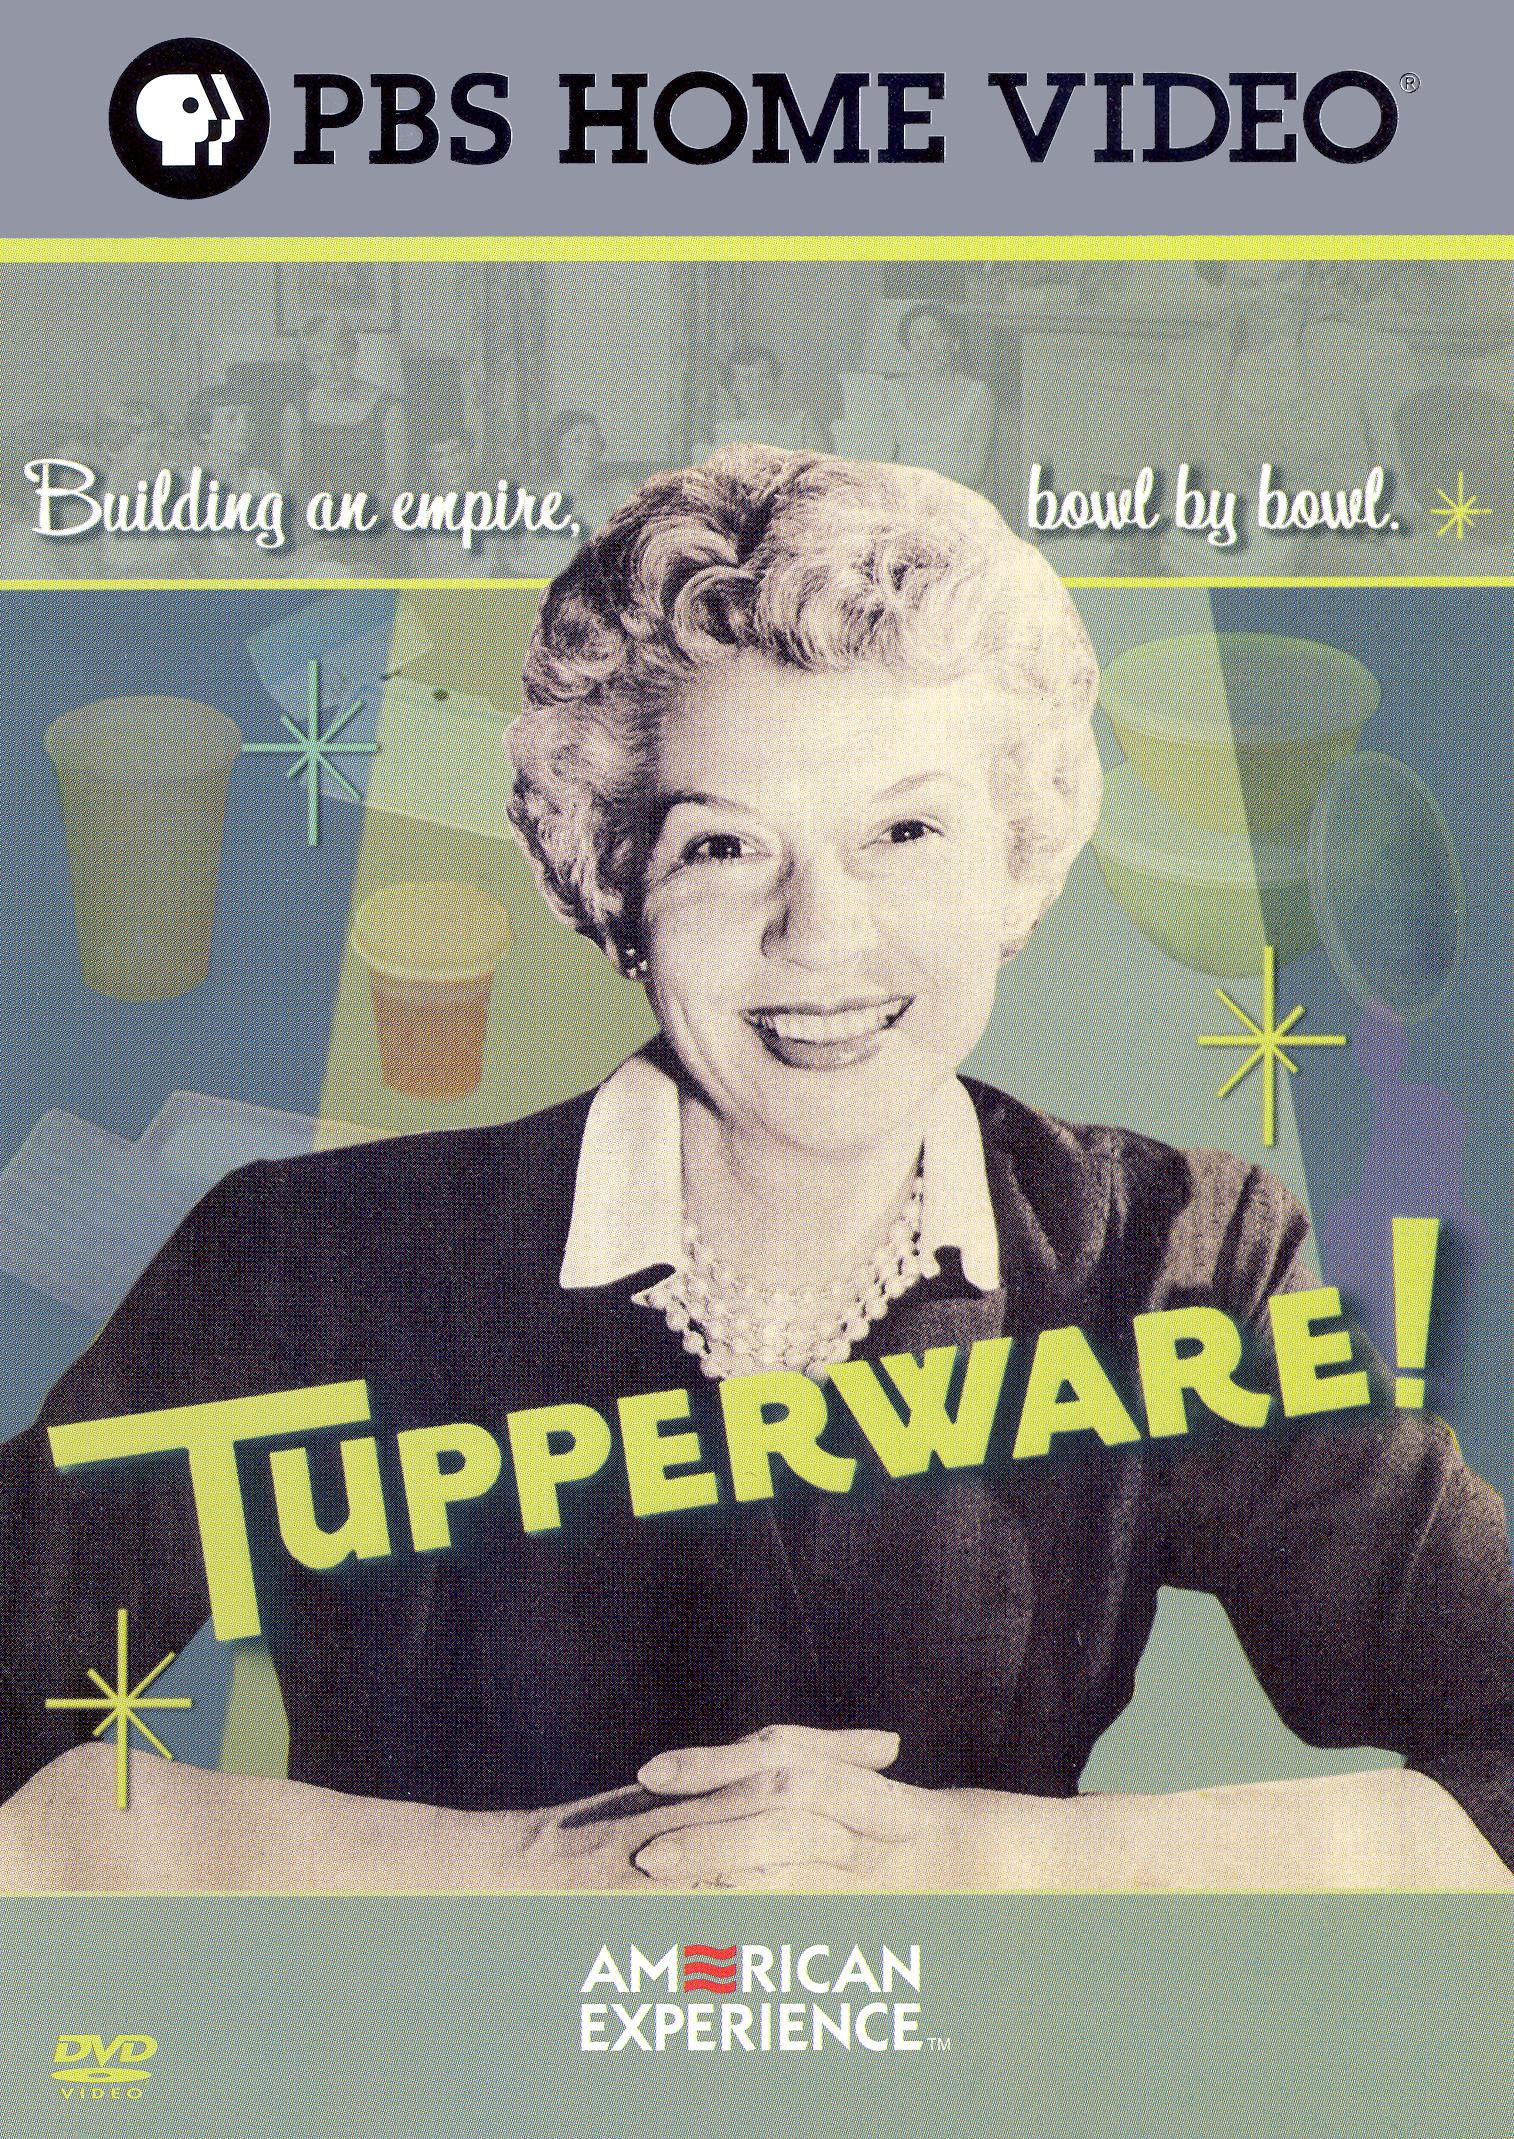 Tupperware!